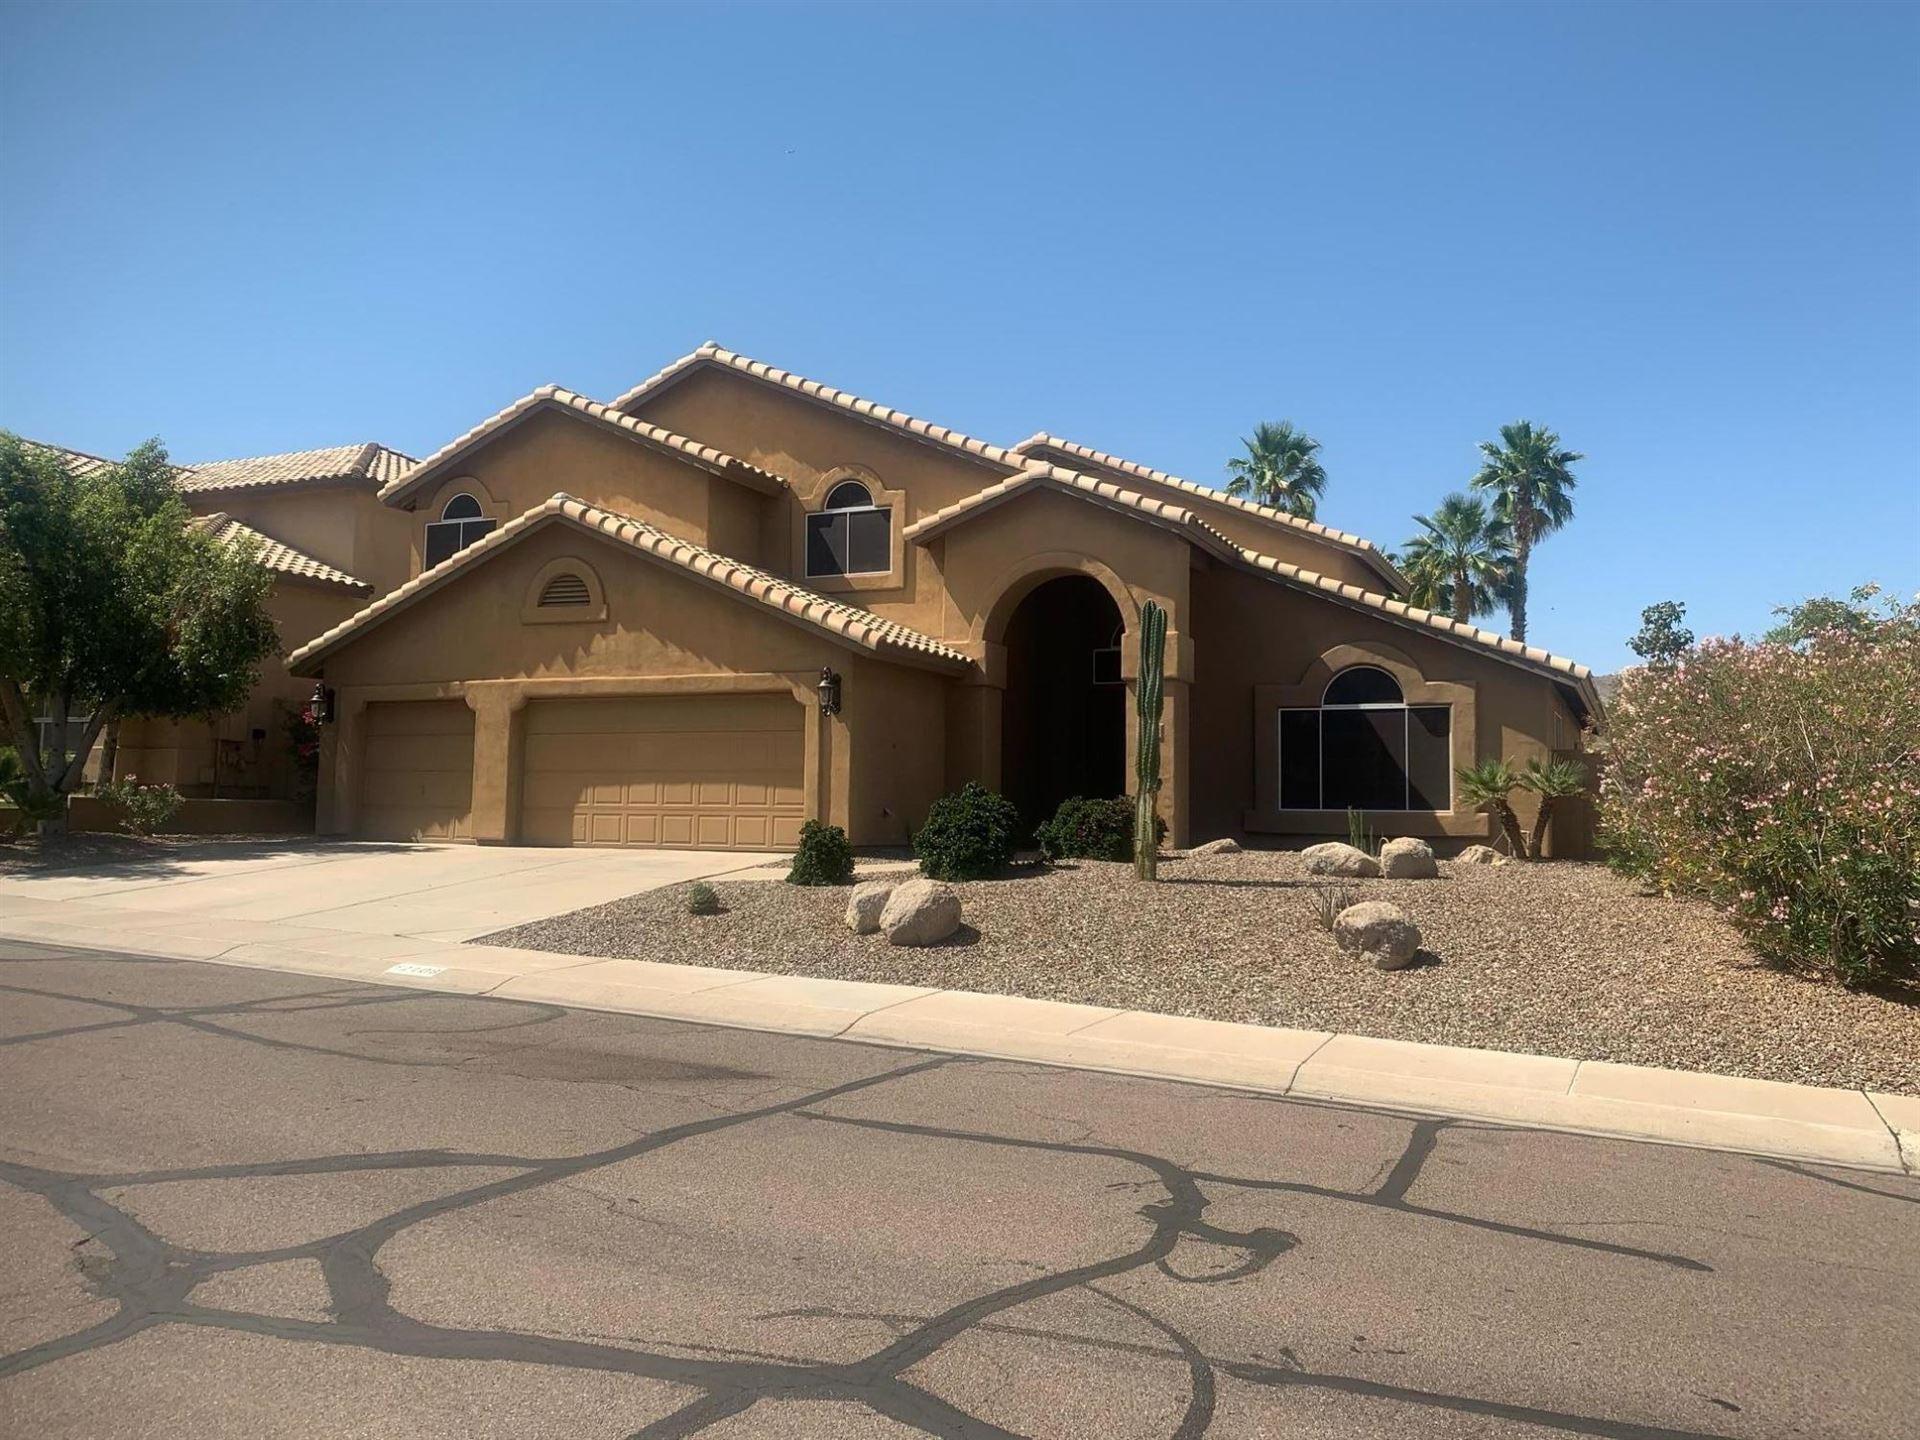 2108 E TECOMA Road, Phoenix, AZ 85048 - MLS#: 6234660